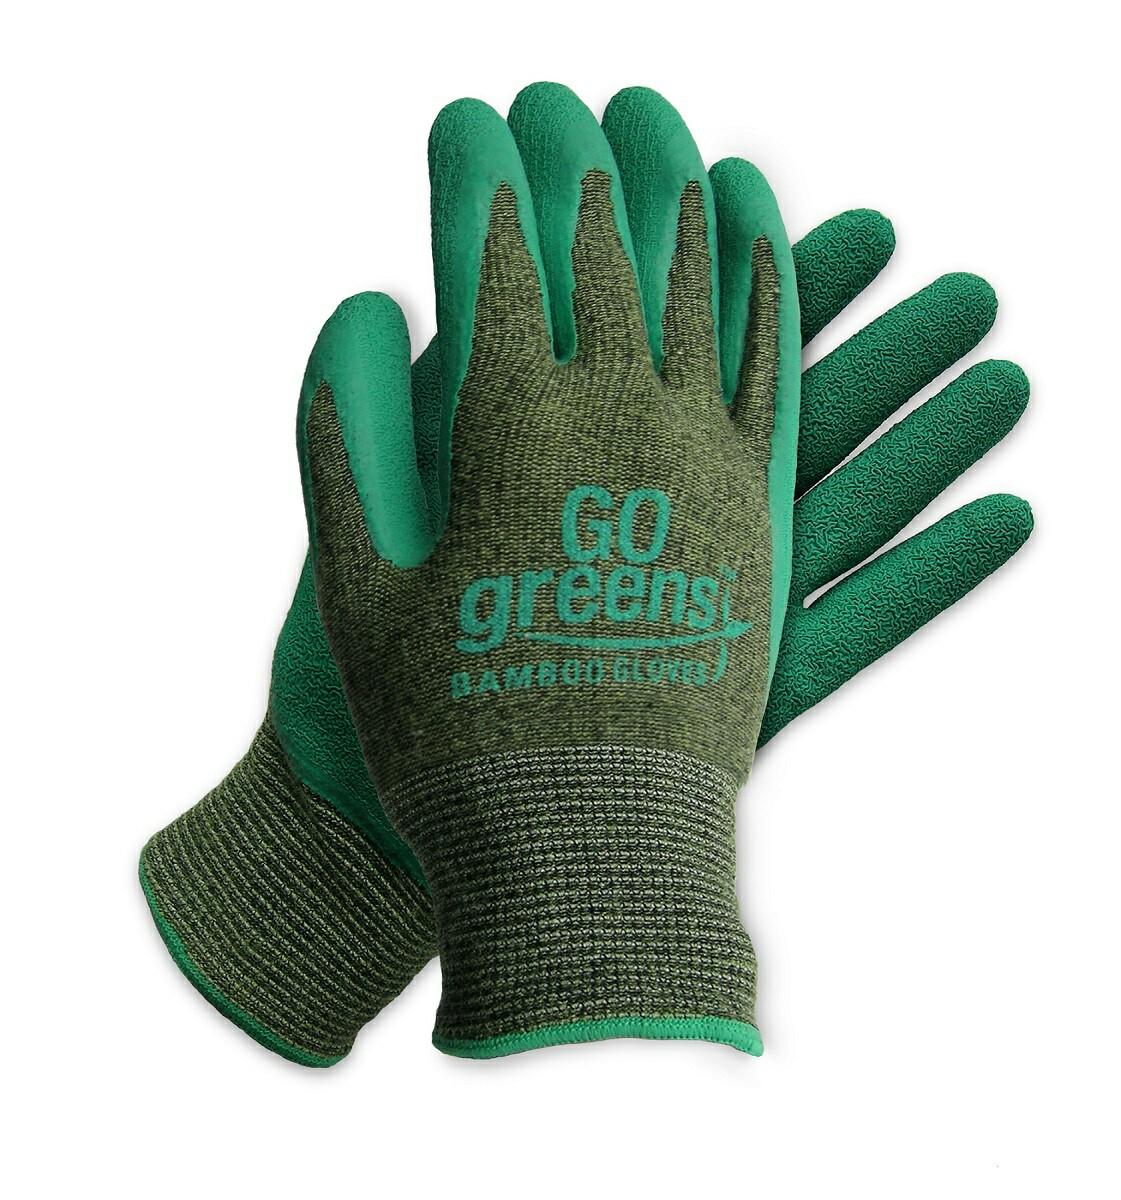 GO Greens Coated Bamboo Gloves Bamboo gloves GlovesOnline